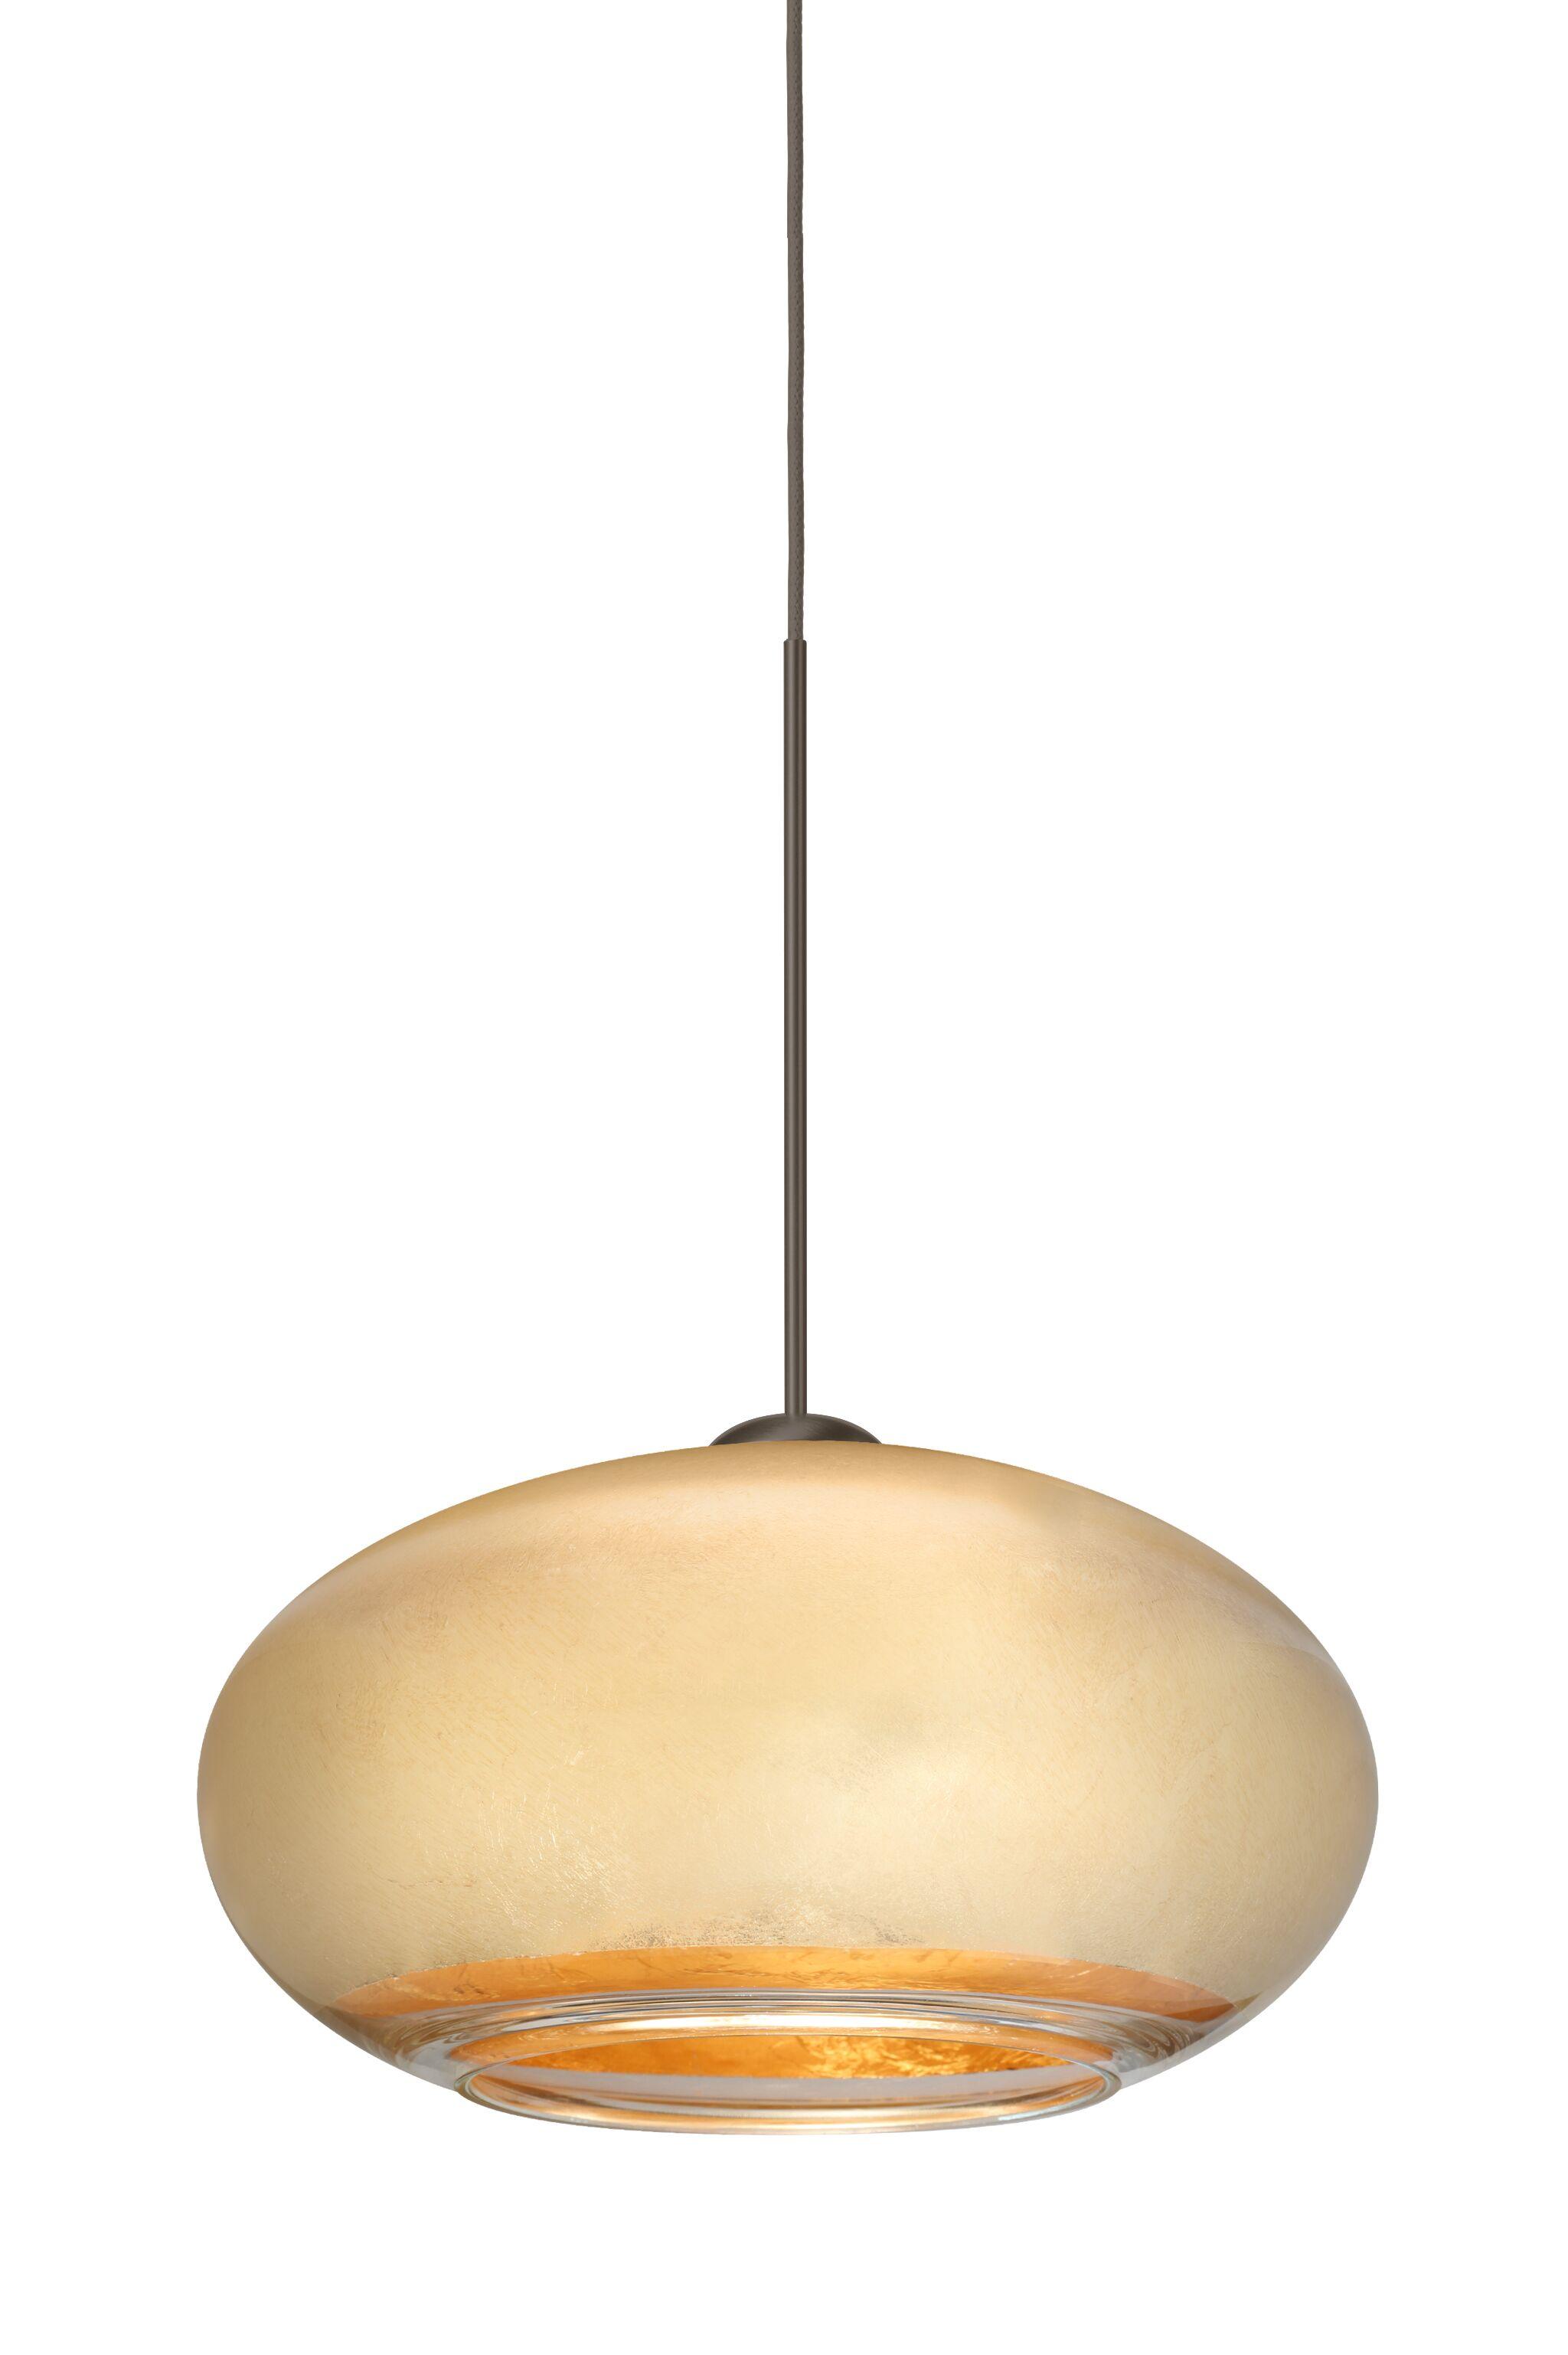 Brio 1-Light Globe Pendant Finish: Brushed Bronze, Shade Color: Gold Foil